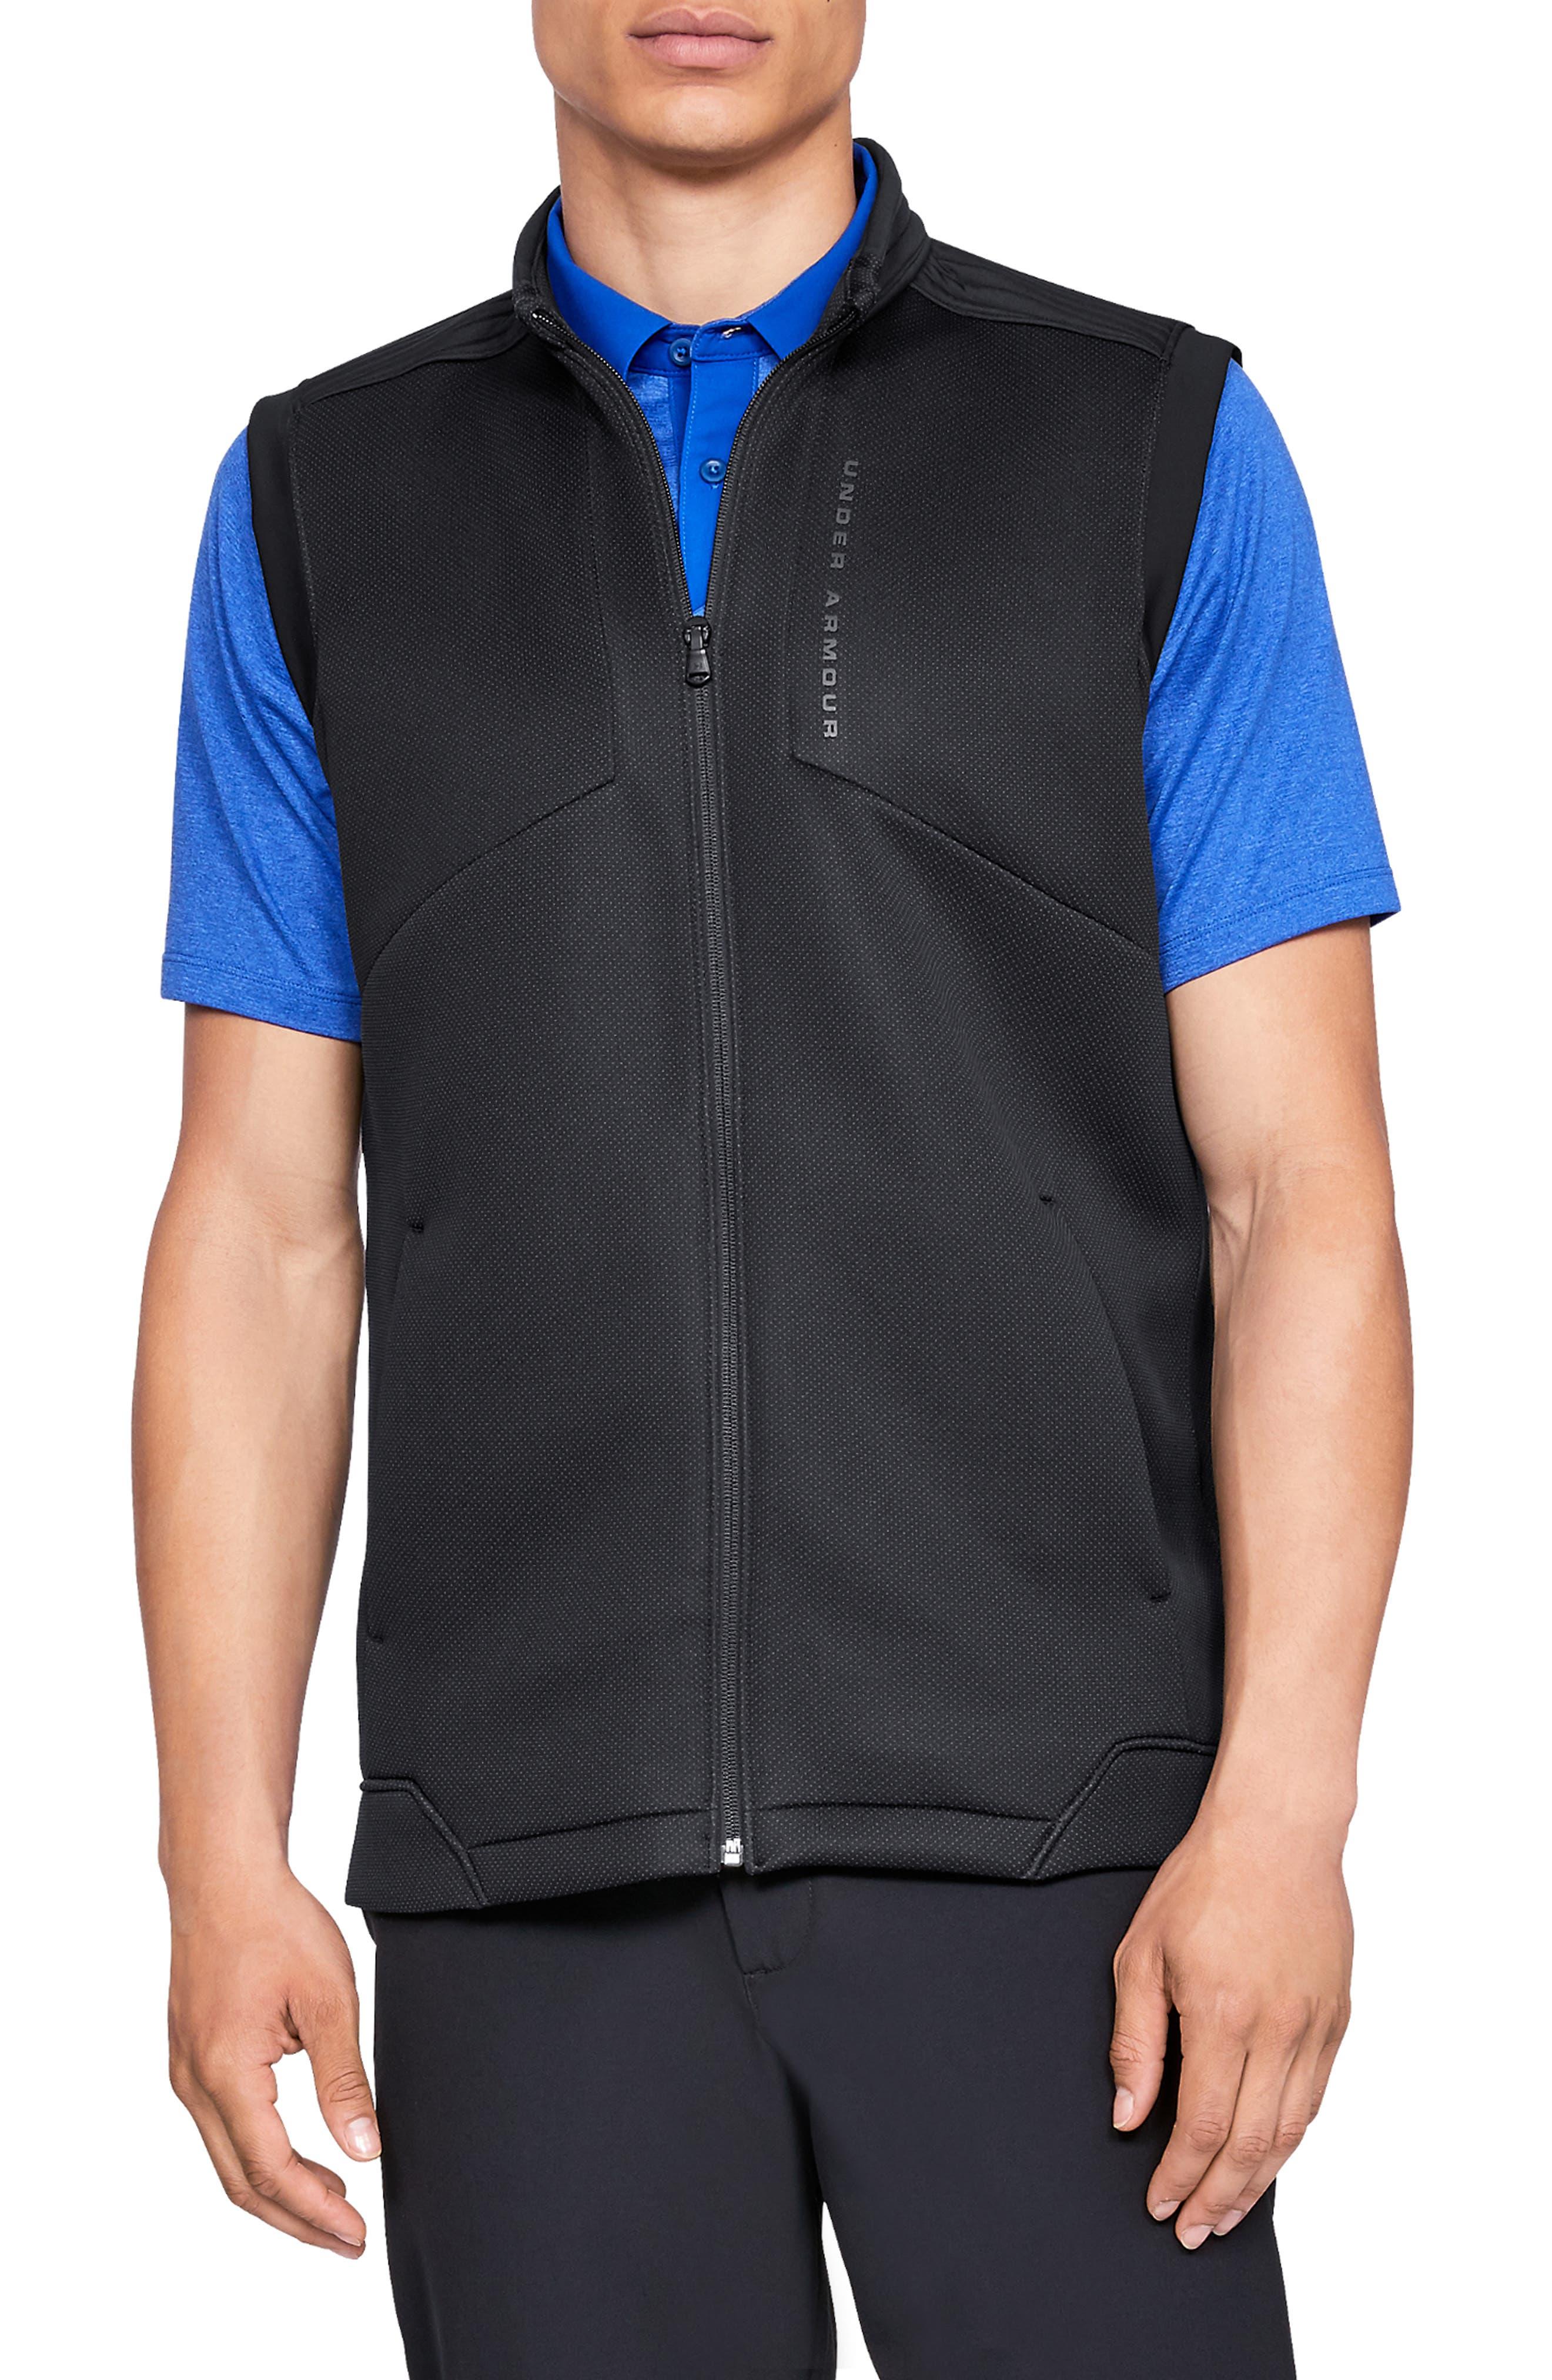 Storm Daytona Vest,                         Main,                         color, BLACK/ BLACK/ BLACK